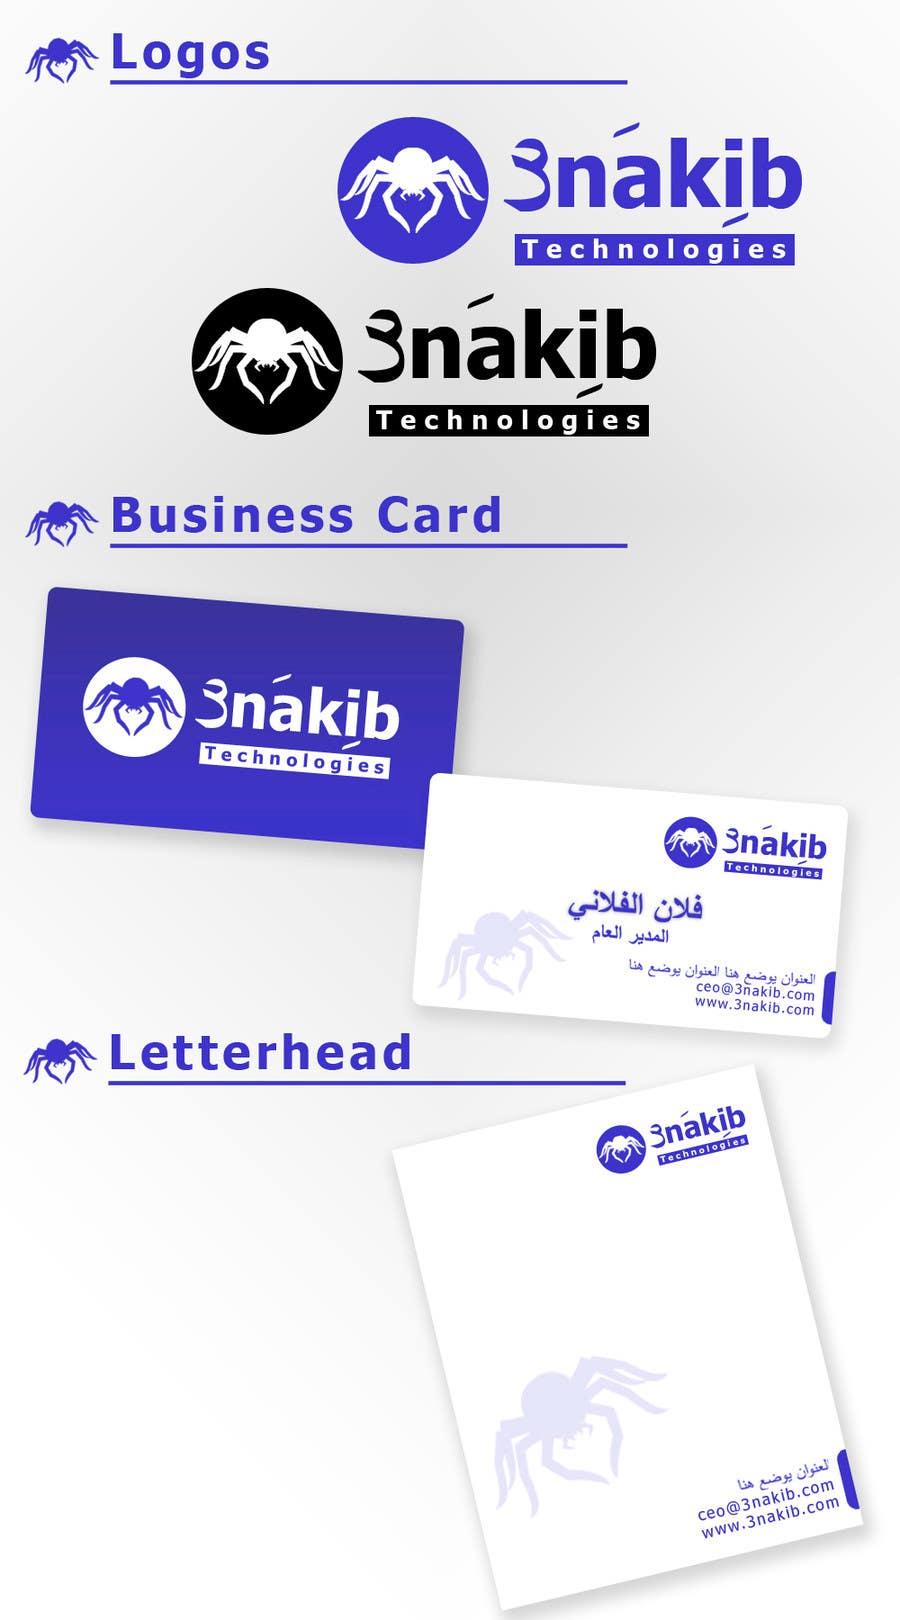 Kilpailutyö #40 kilpailussa Develop a Corporate Identity for 3nkaib Technologies (Spiders)